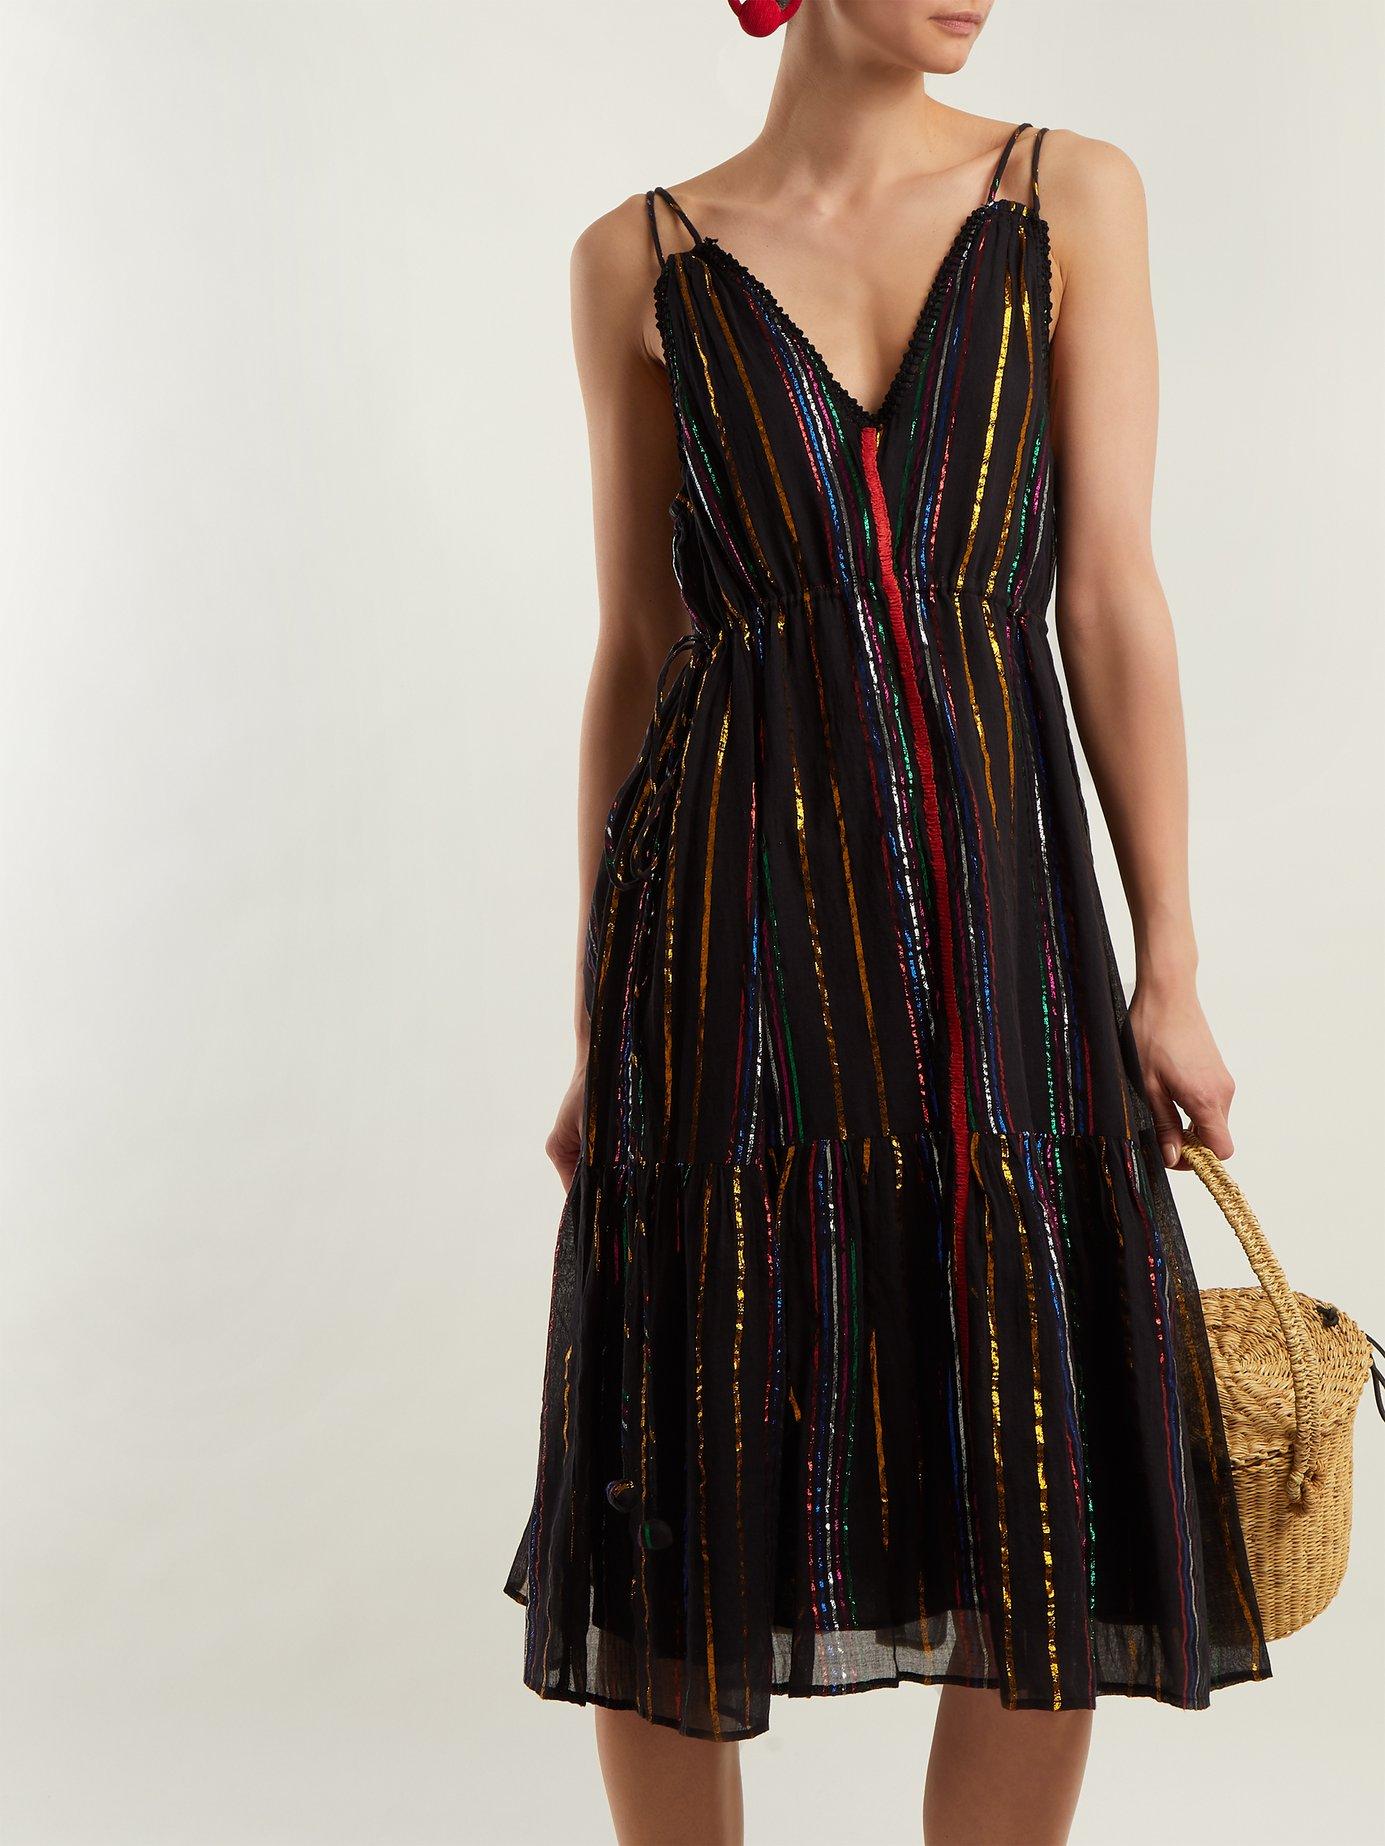 Daphne striped cotton-blend dress by Apiece Apart